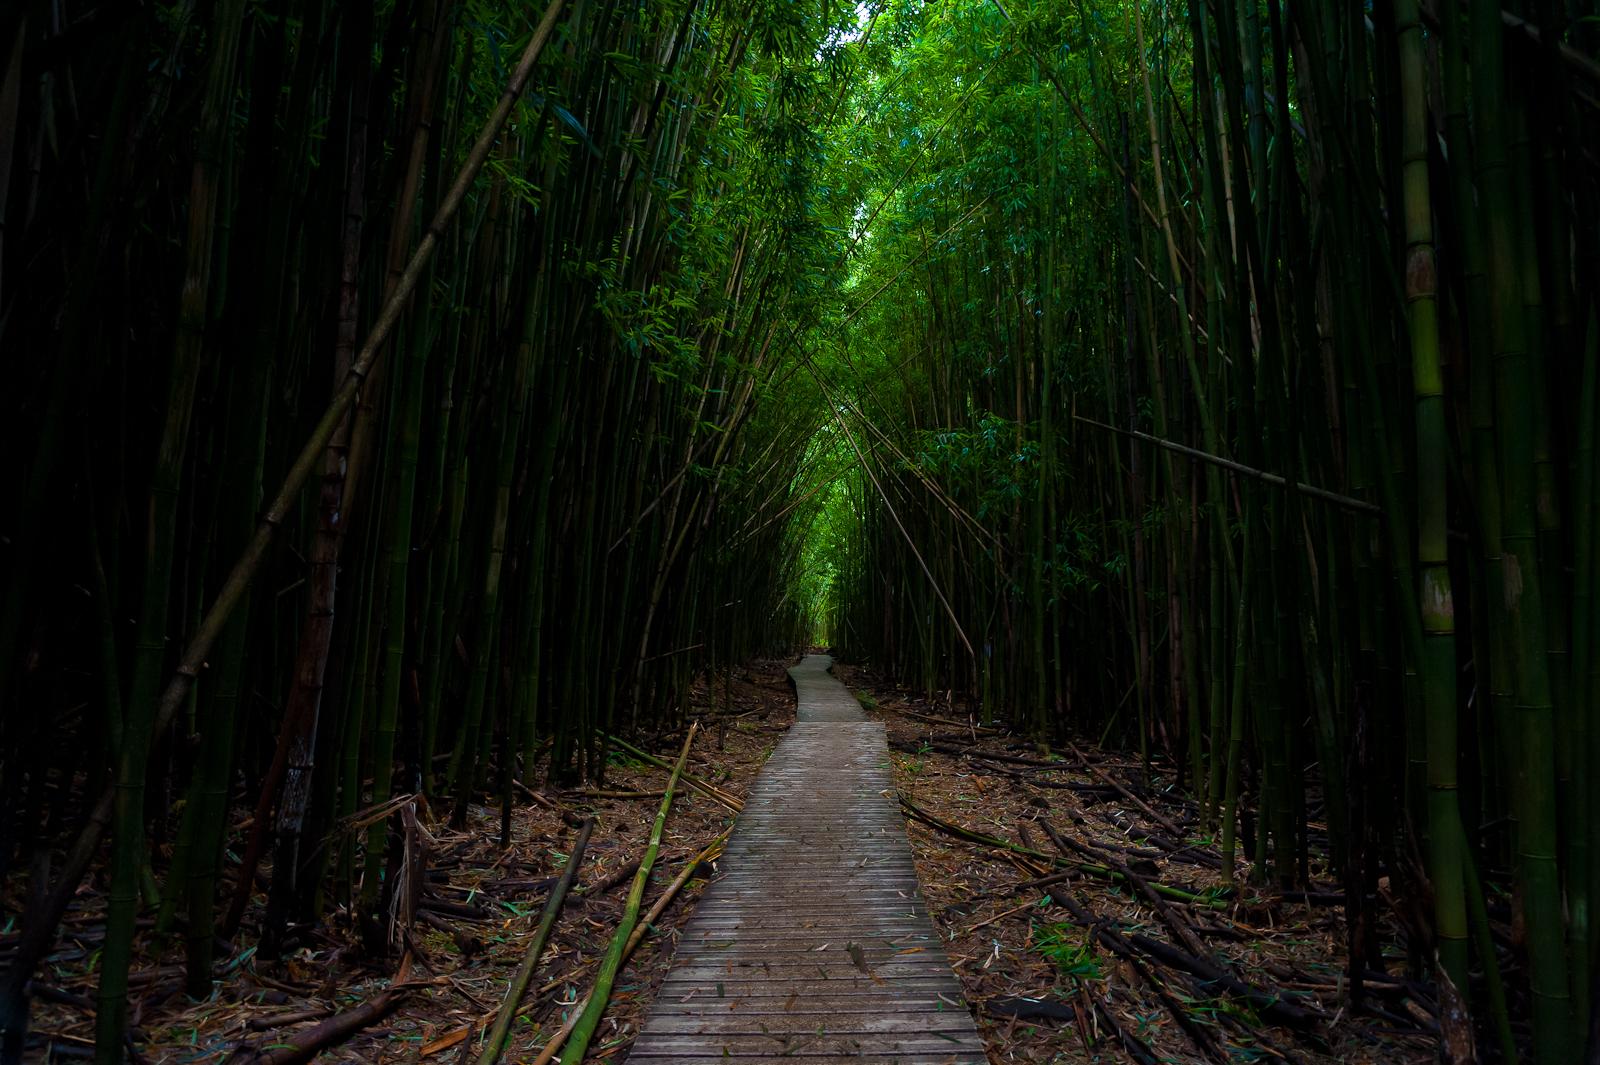 Pipiwai Trail, Kipahulu District of Haleakala National Park